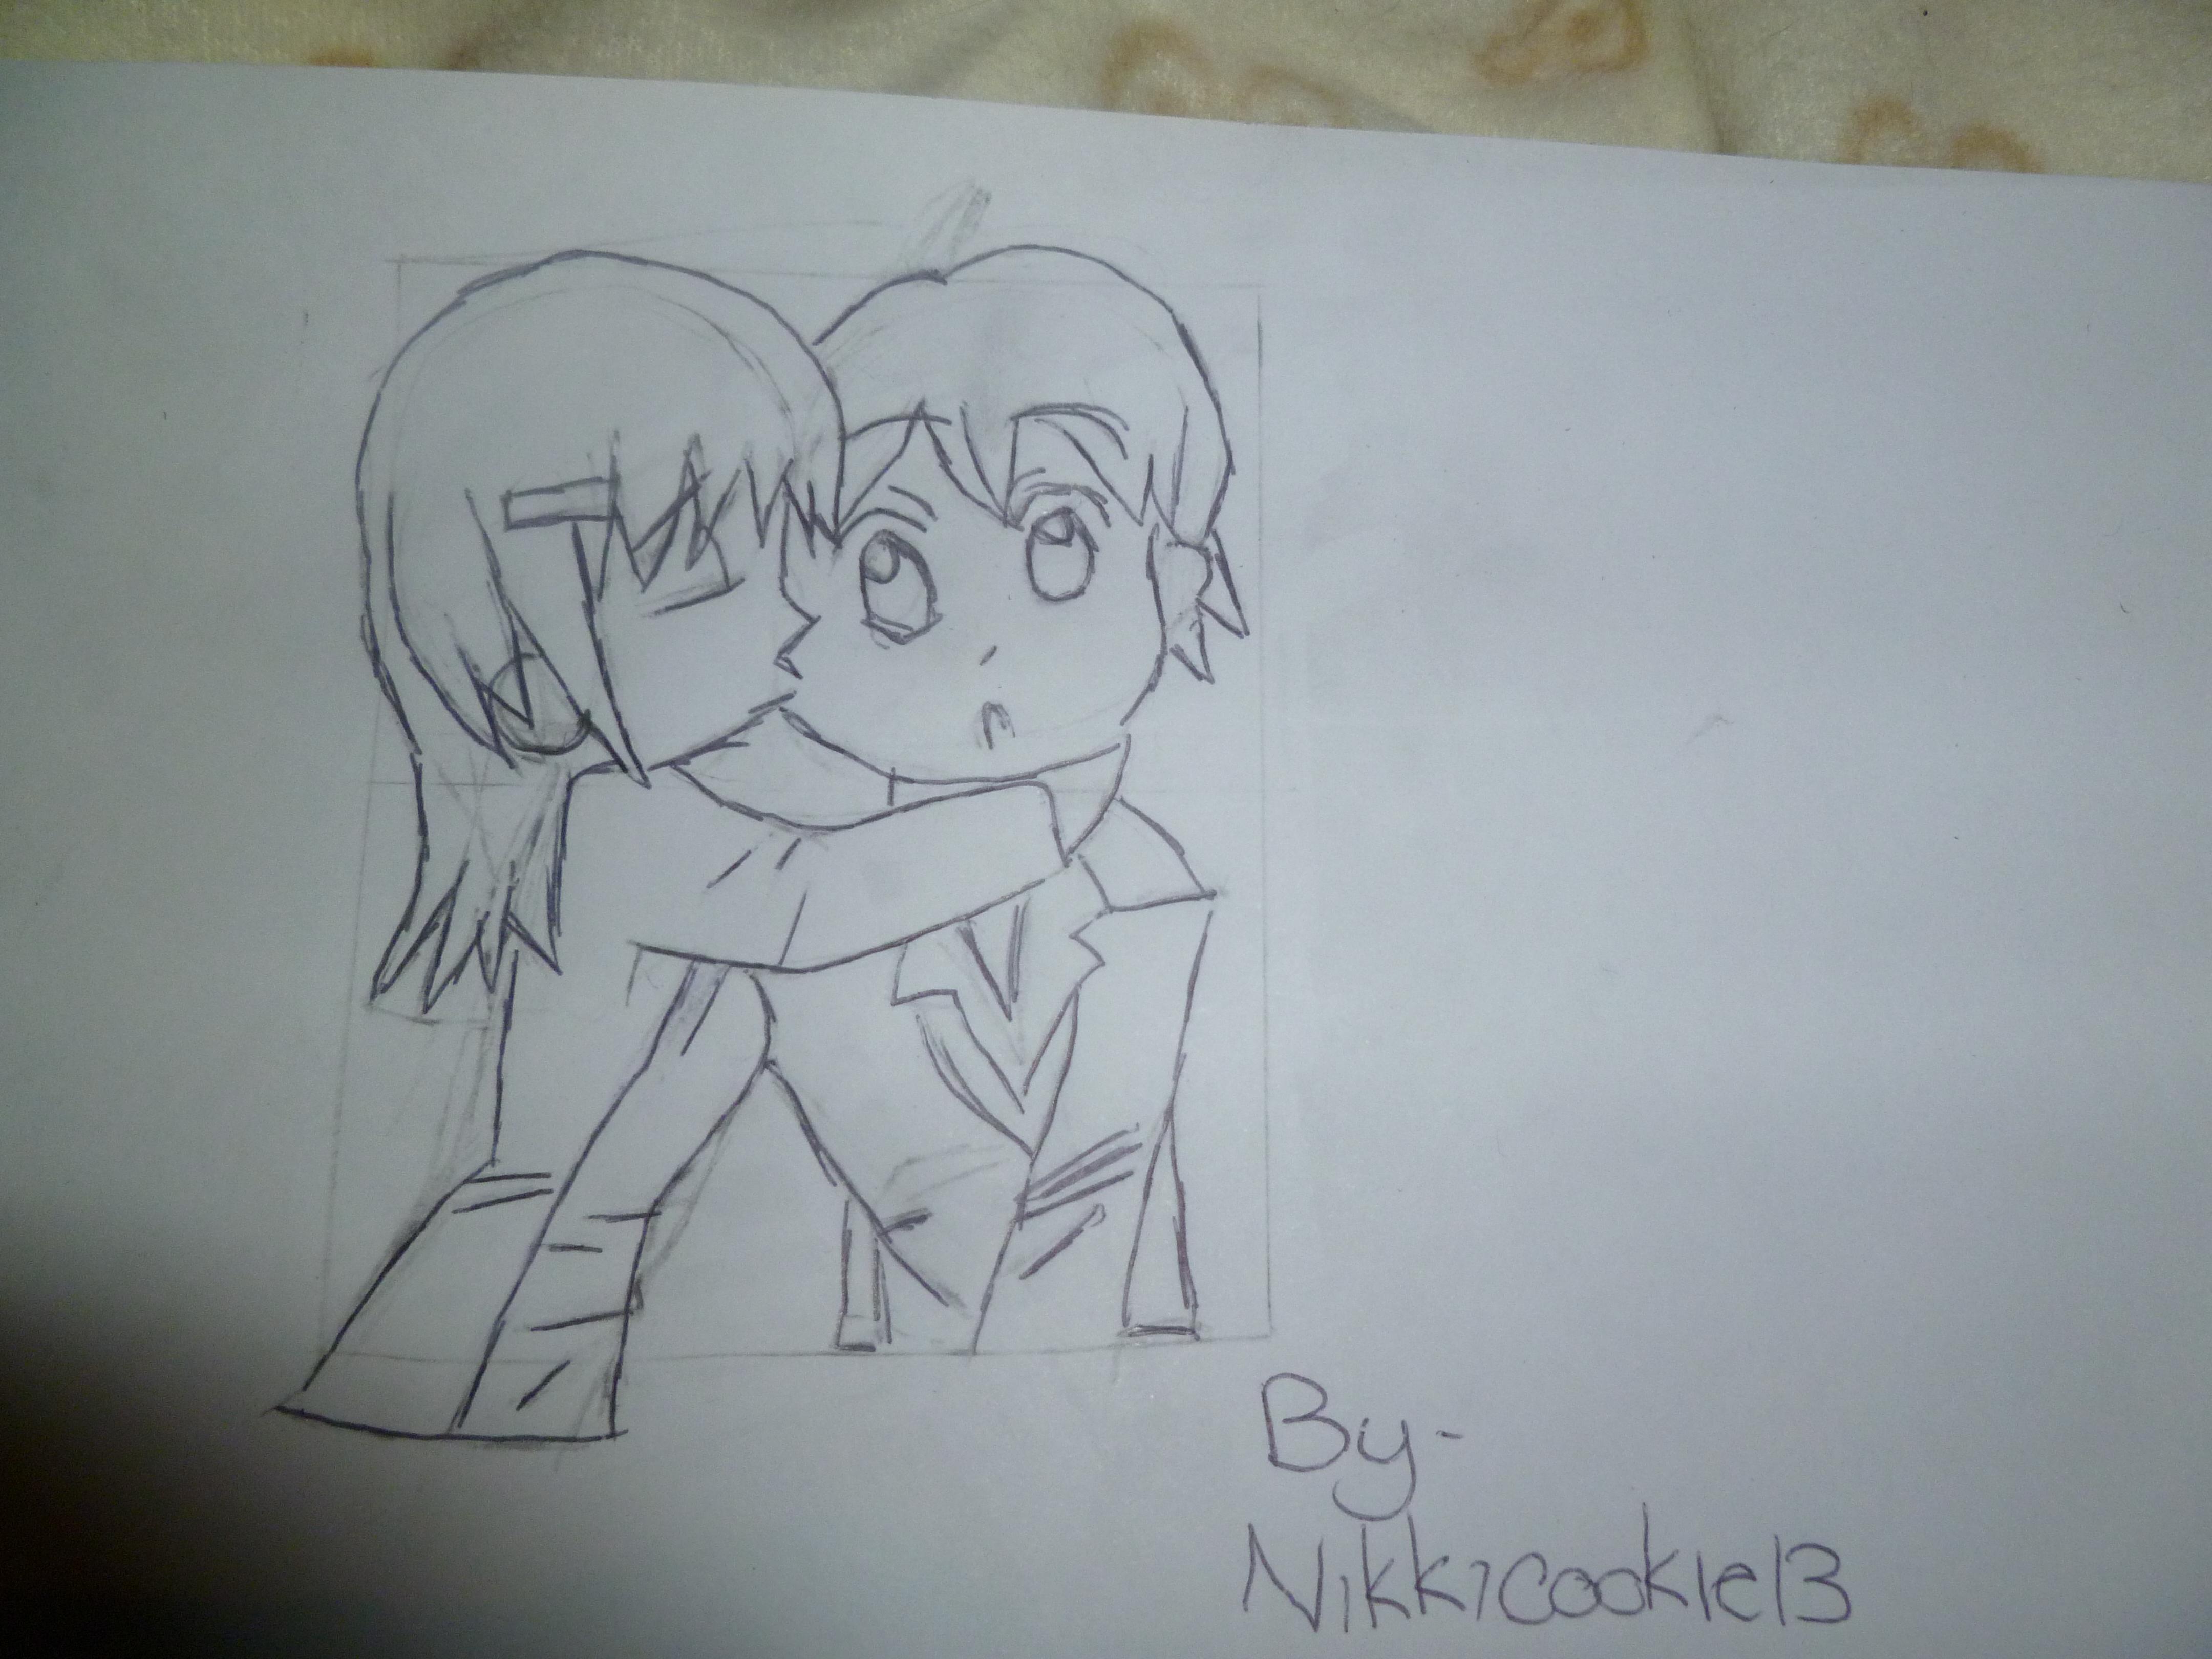 Drawn kisses markcrilley Crilley nikkicookie13 Crilley Credits Drawing